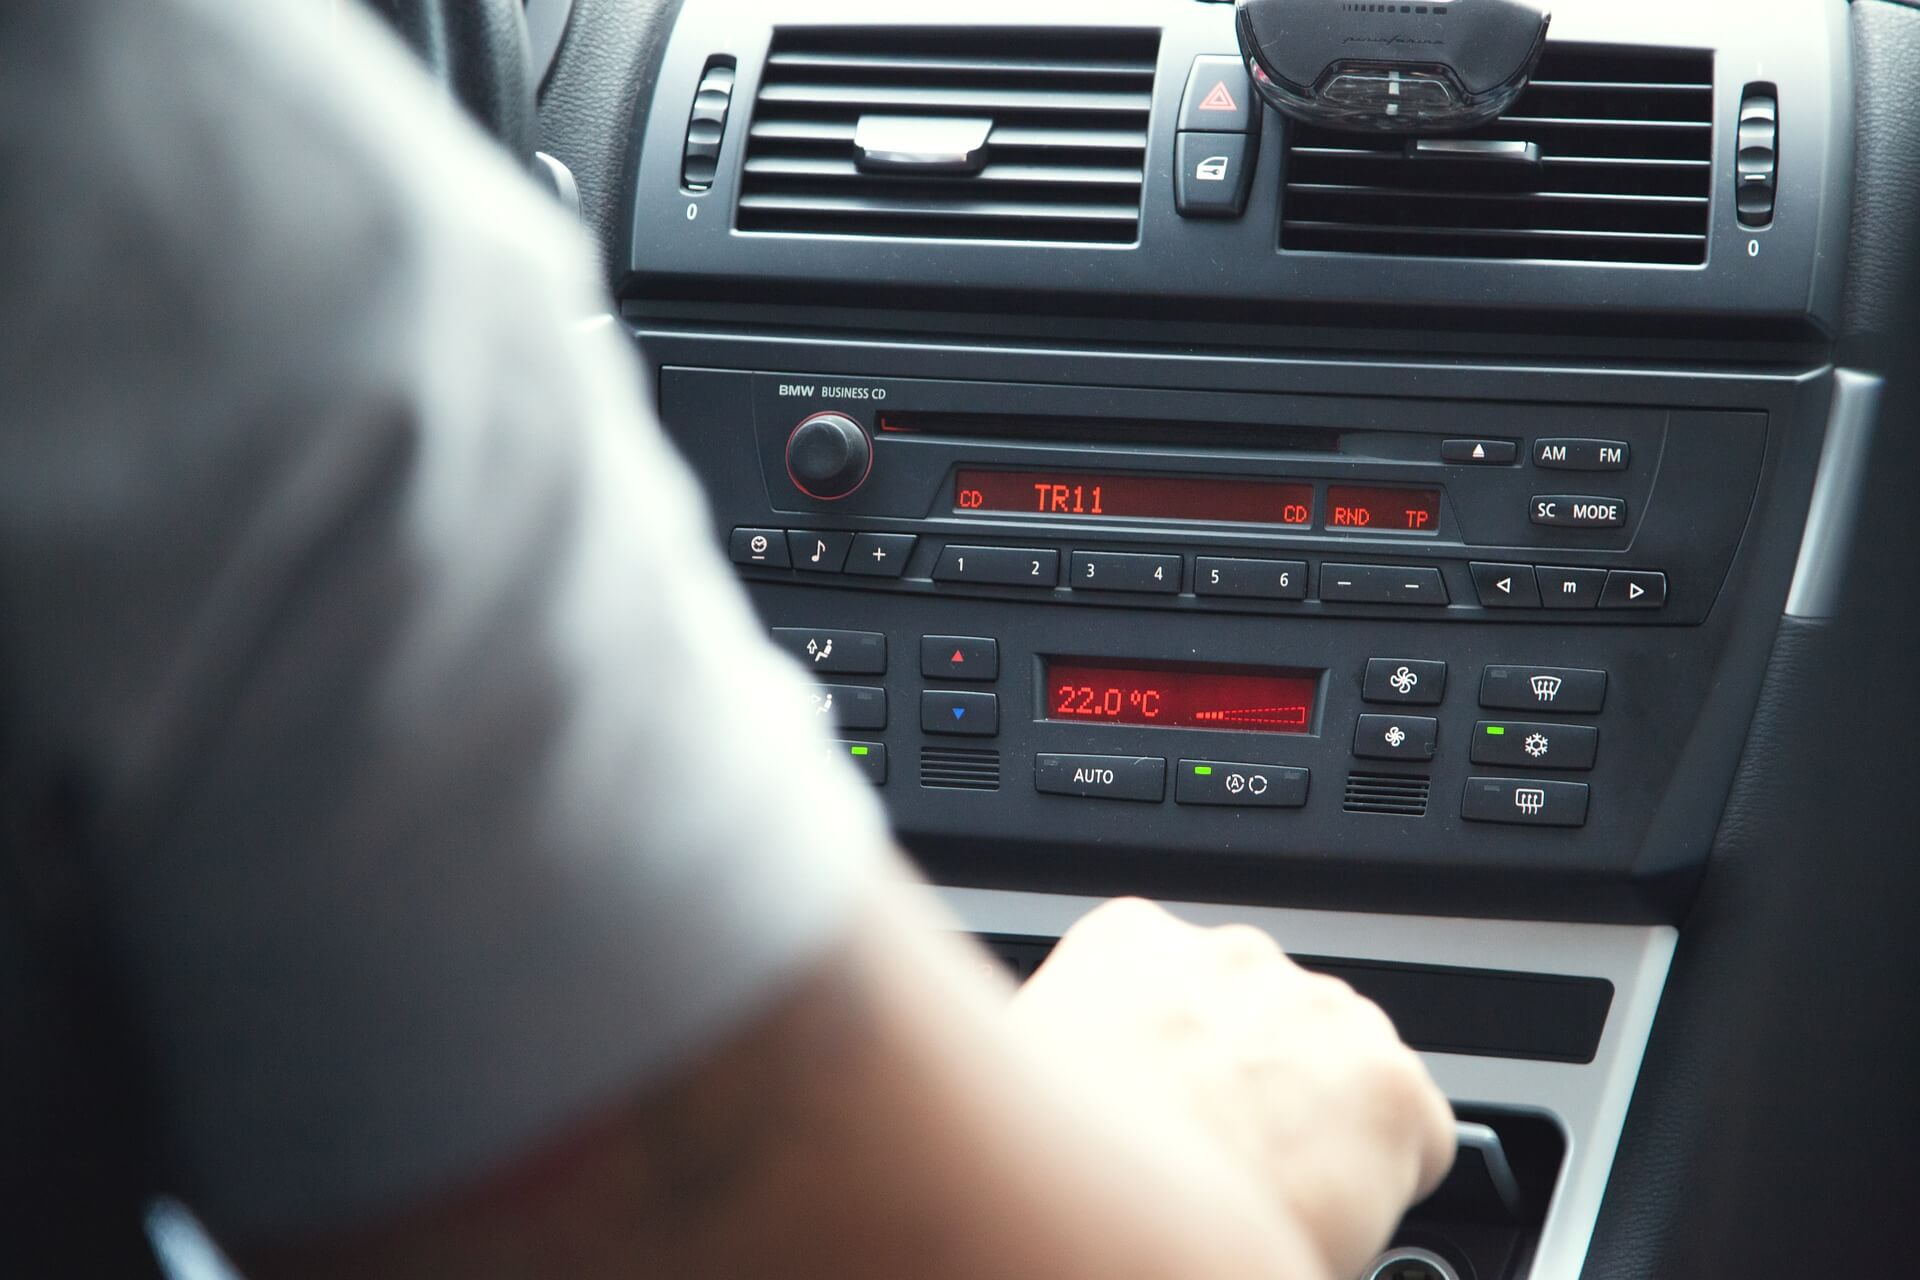 Pendler mit Radio im Auto (c) splitshire / pixabay.de